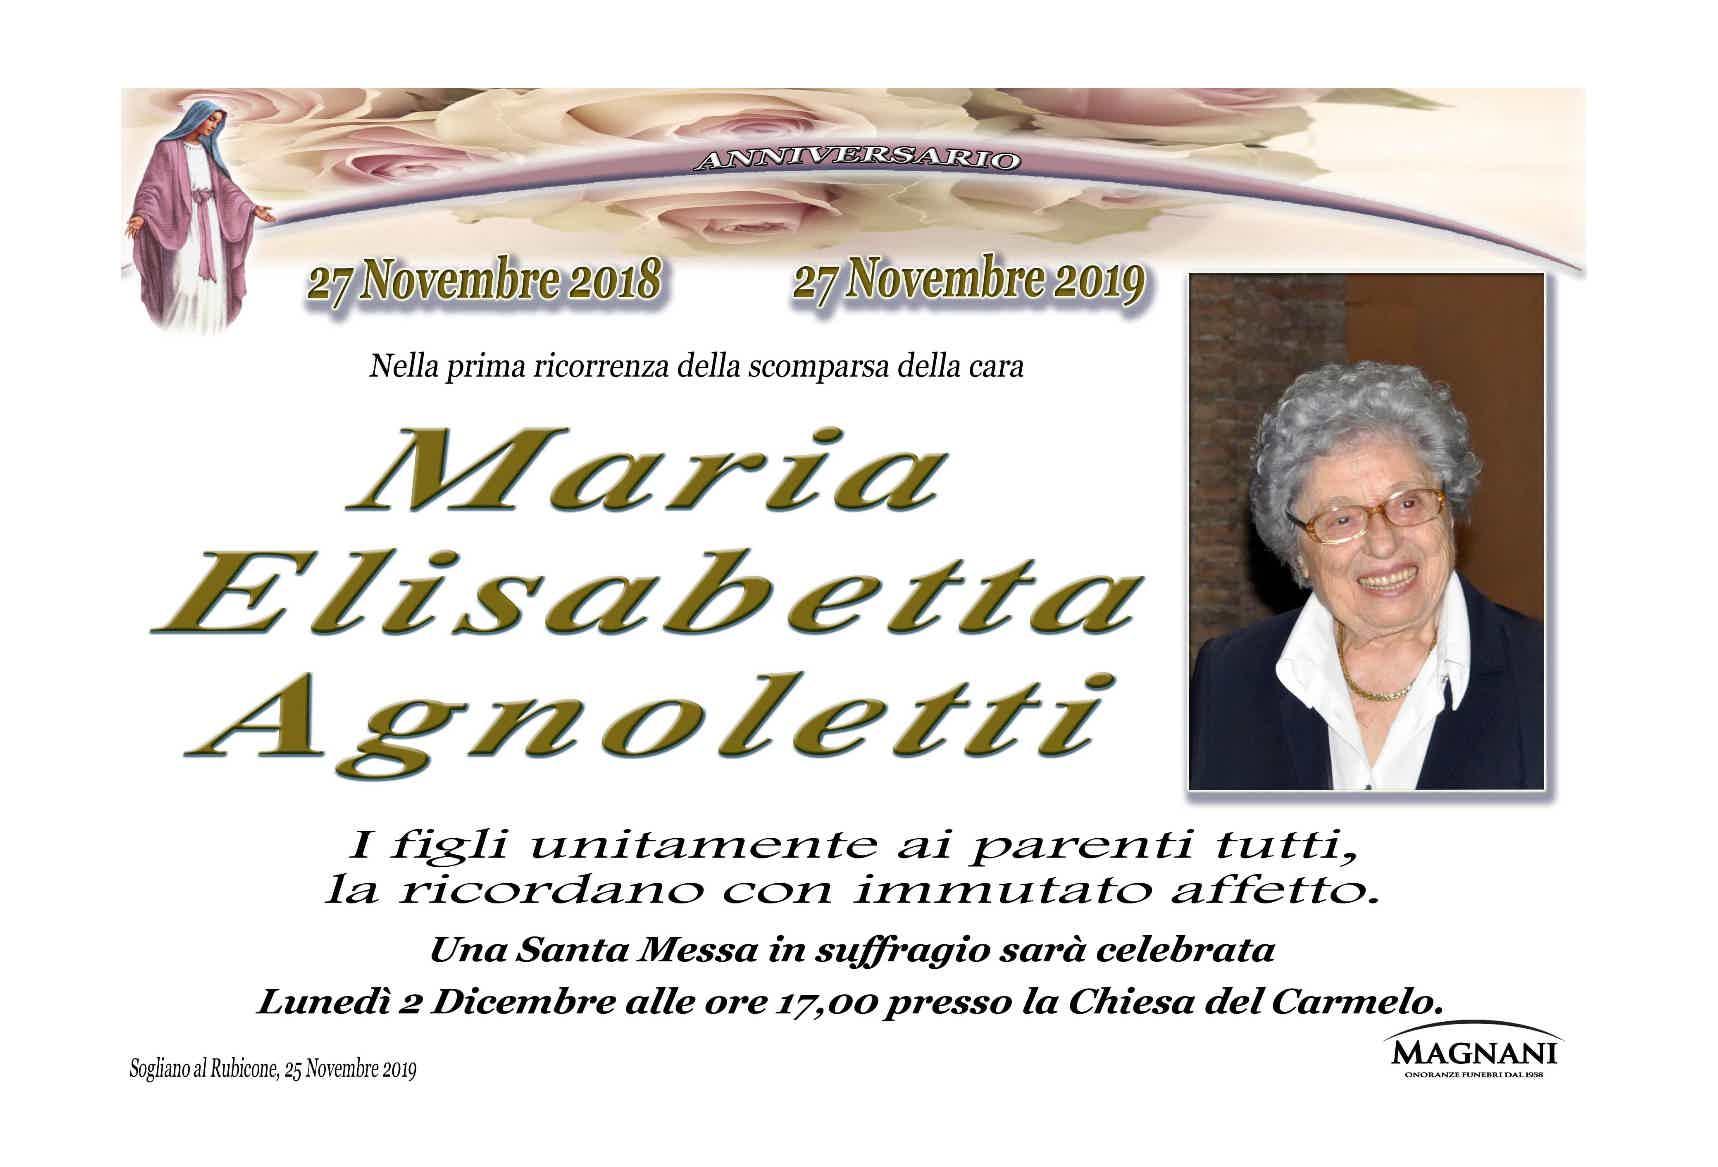 Maria Elisabetta Agnoletti